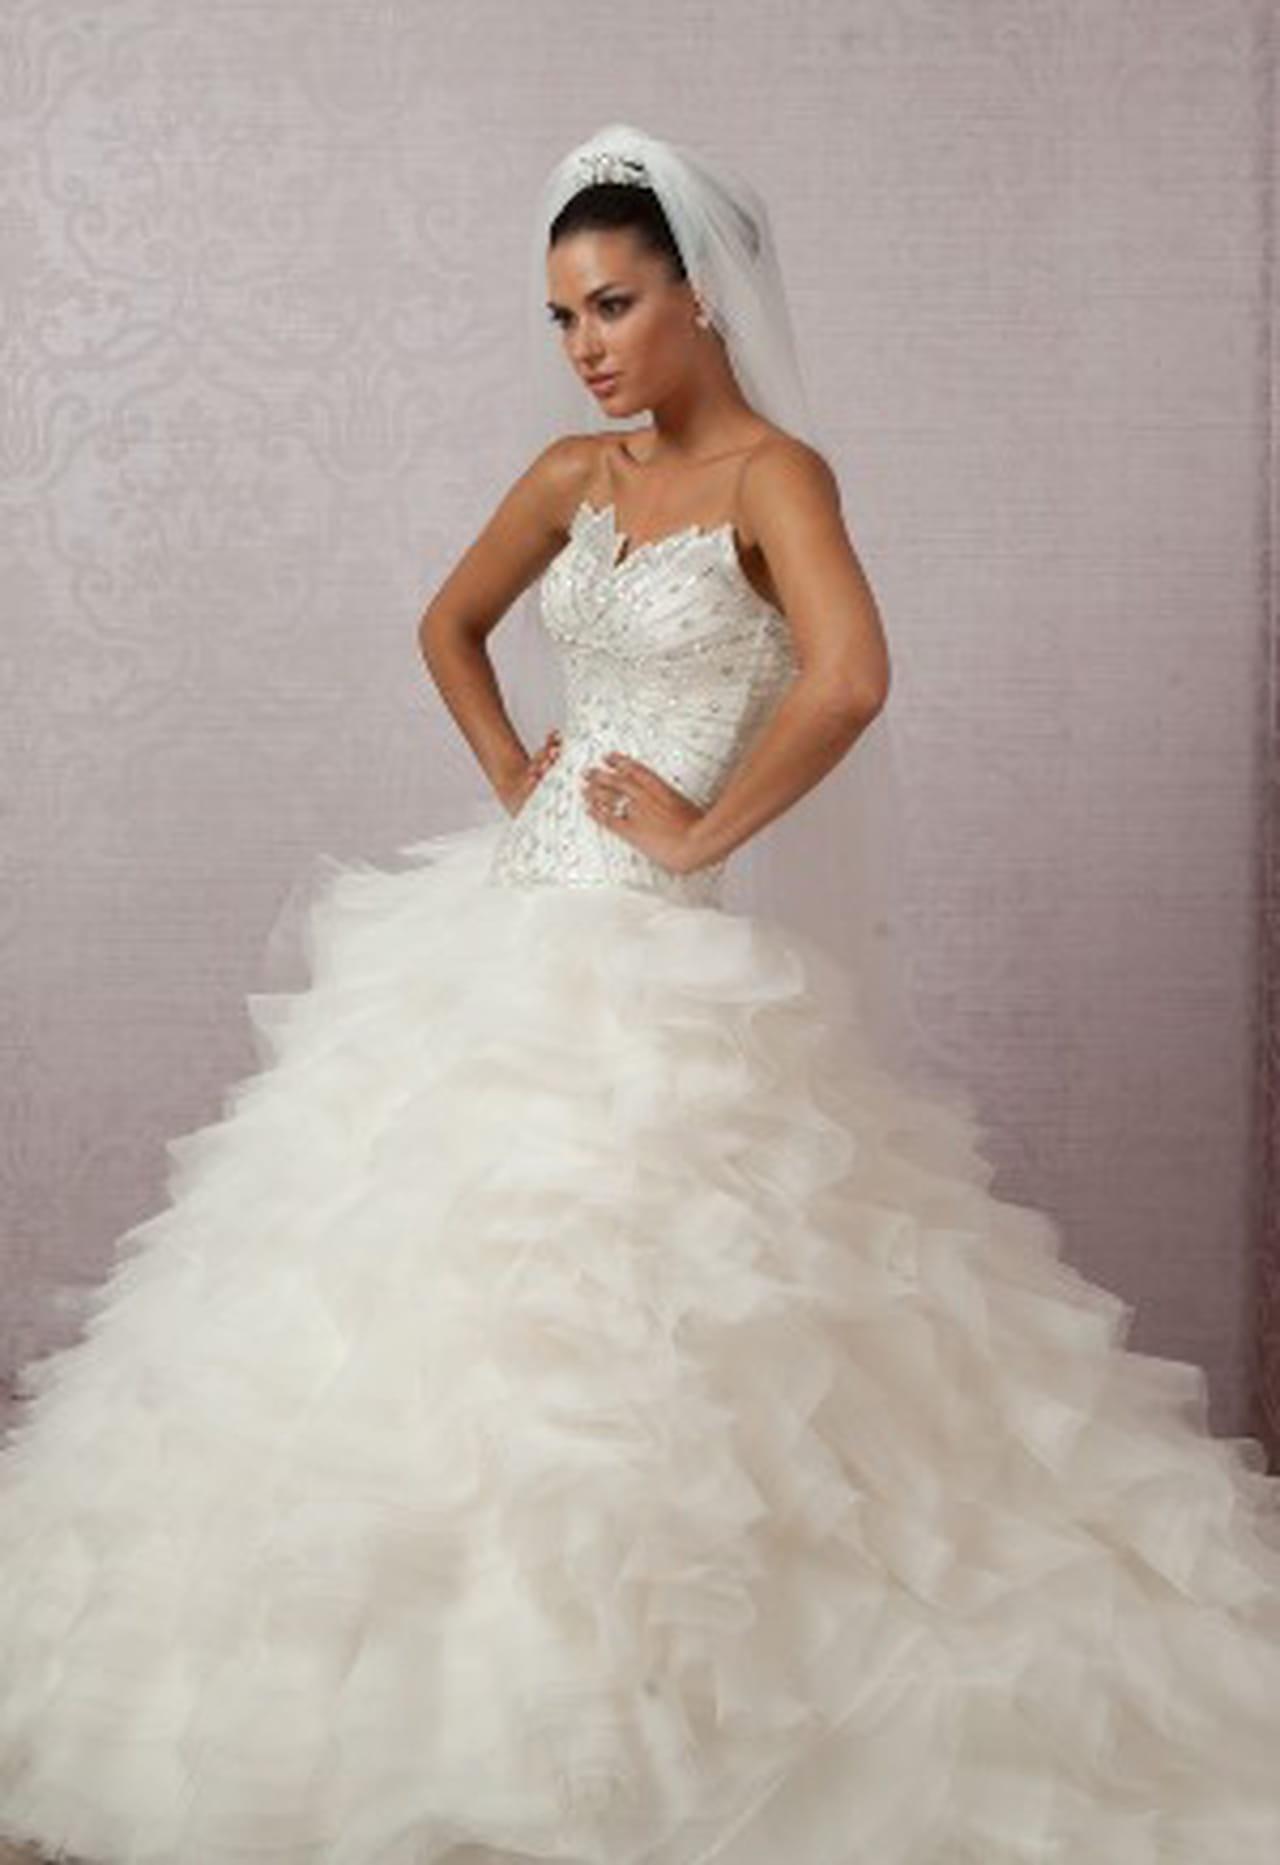 30255cd8fa340 النعومة والرقة تميز فساتين الزفاف التركية للعروس 2014 Turkish wedding  dresses